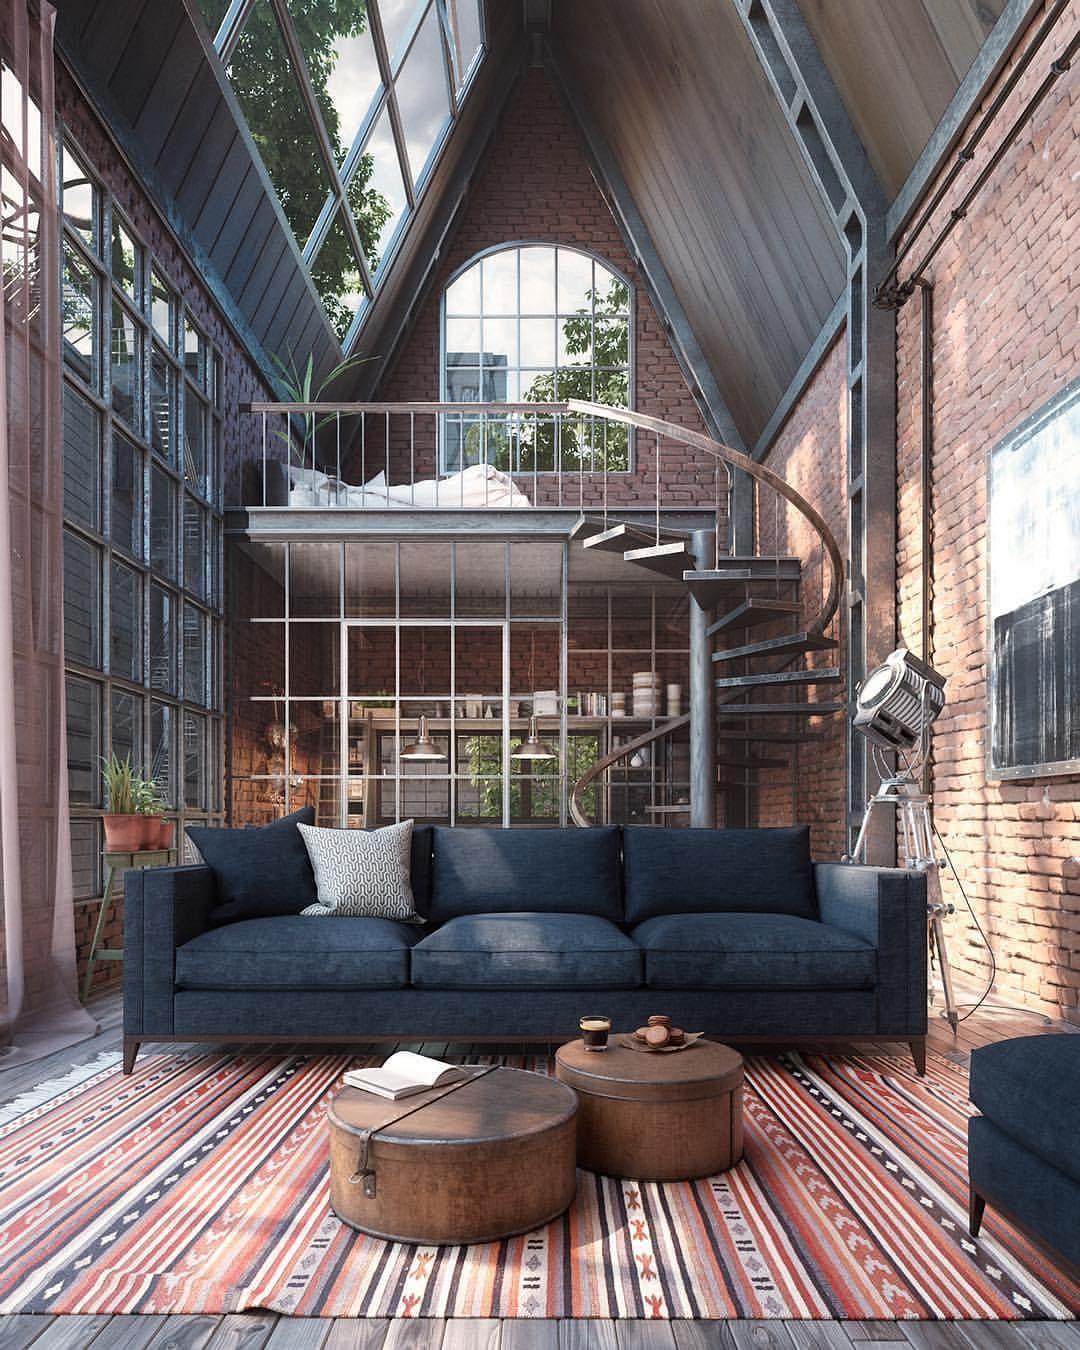 Interior Design On Instagram Industrial Loft Designed By Daniela Bringas Loft Industrialdesign Living Livingr Industrial House Loft Design House Design